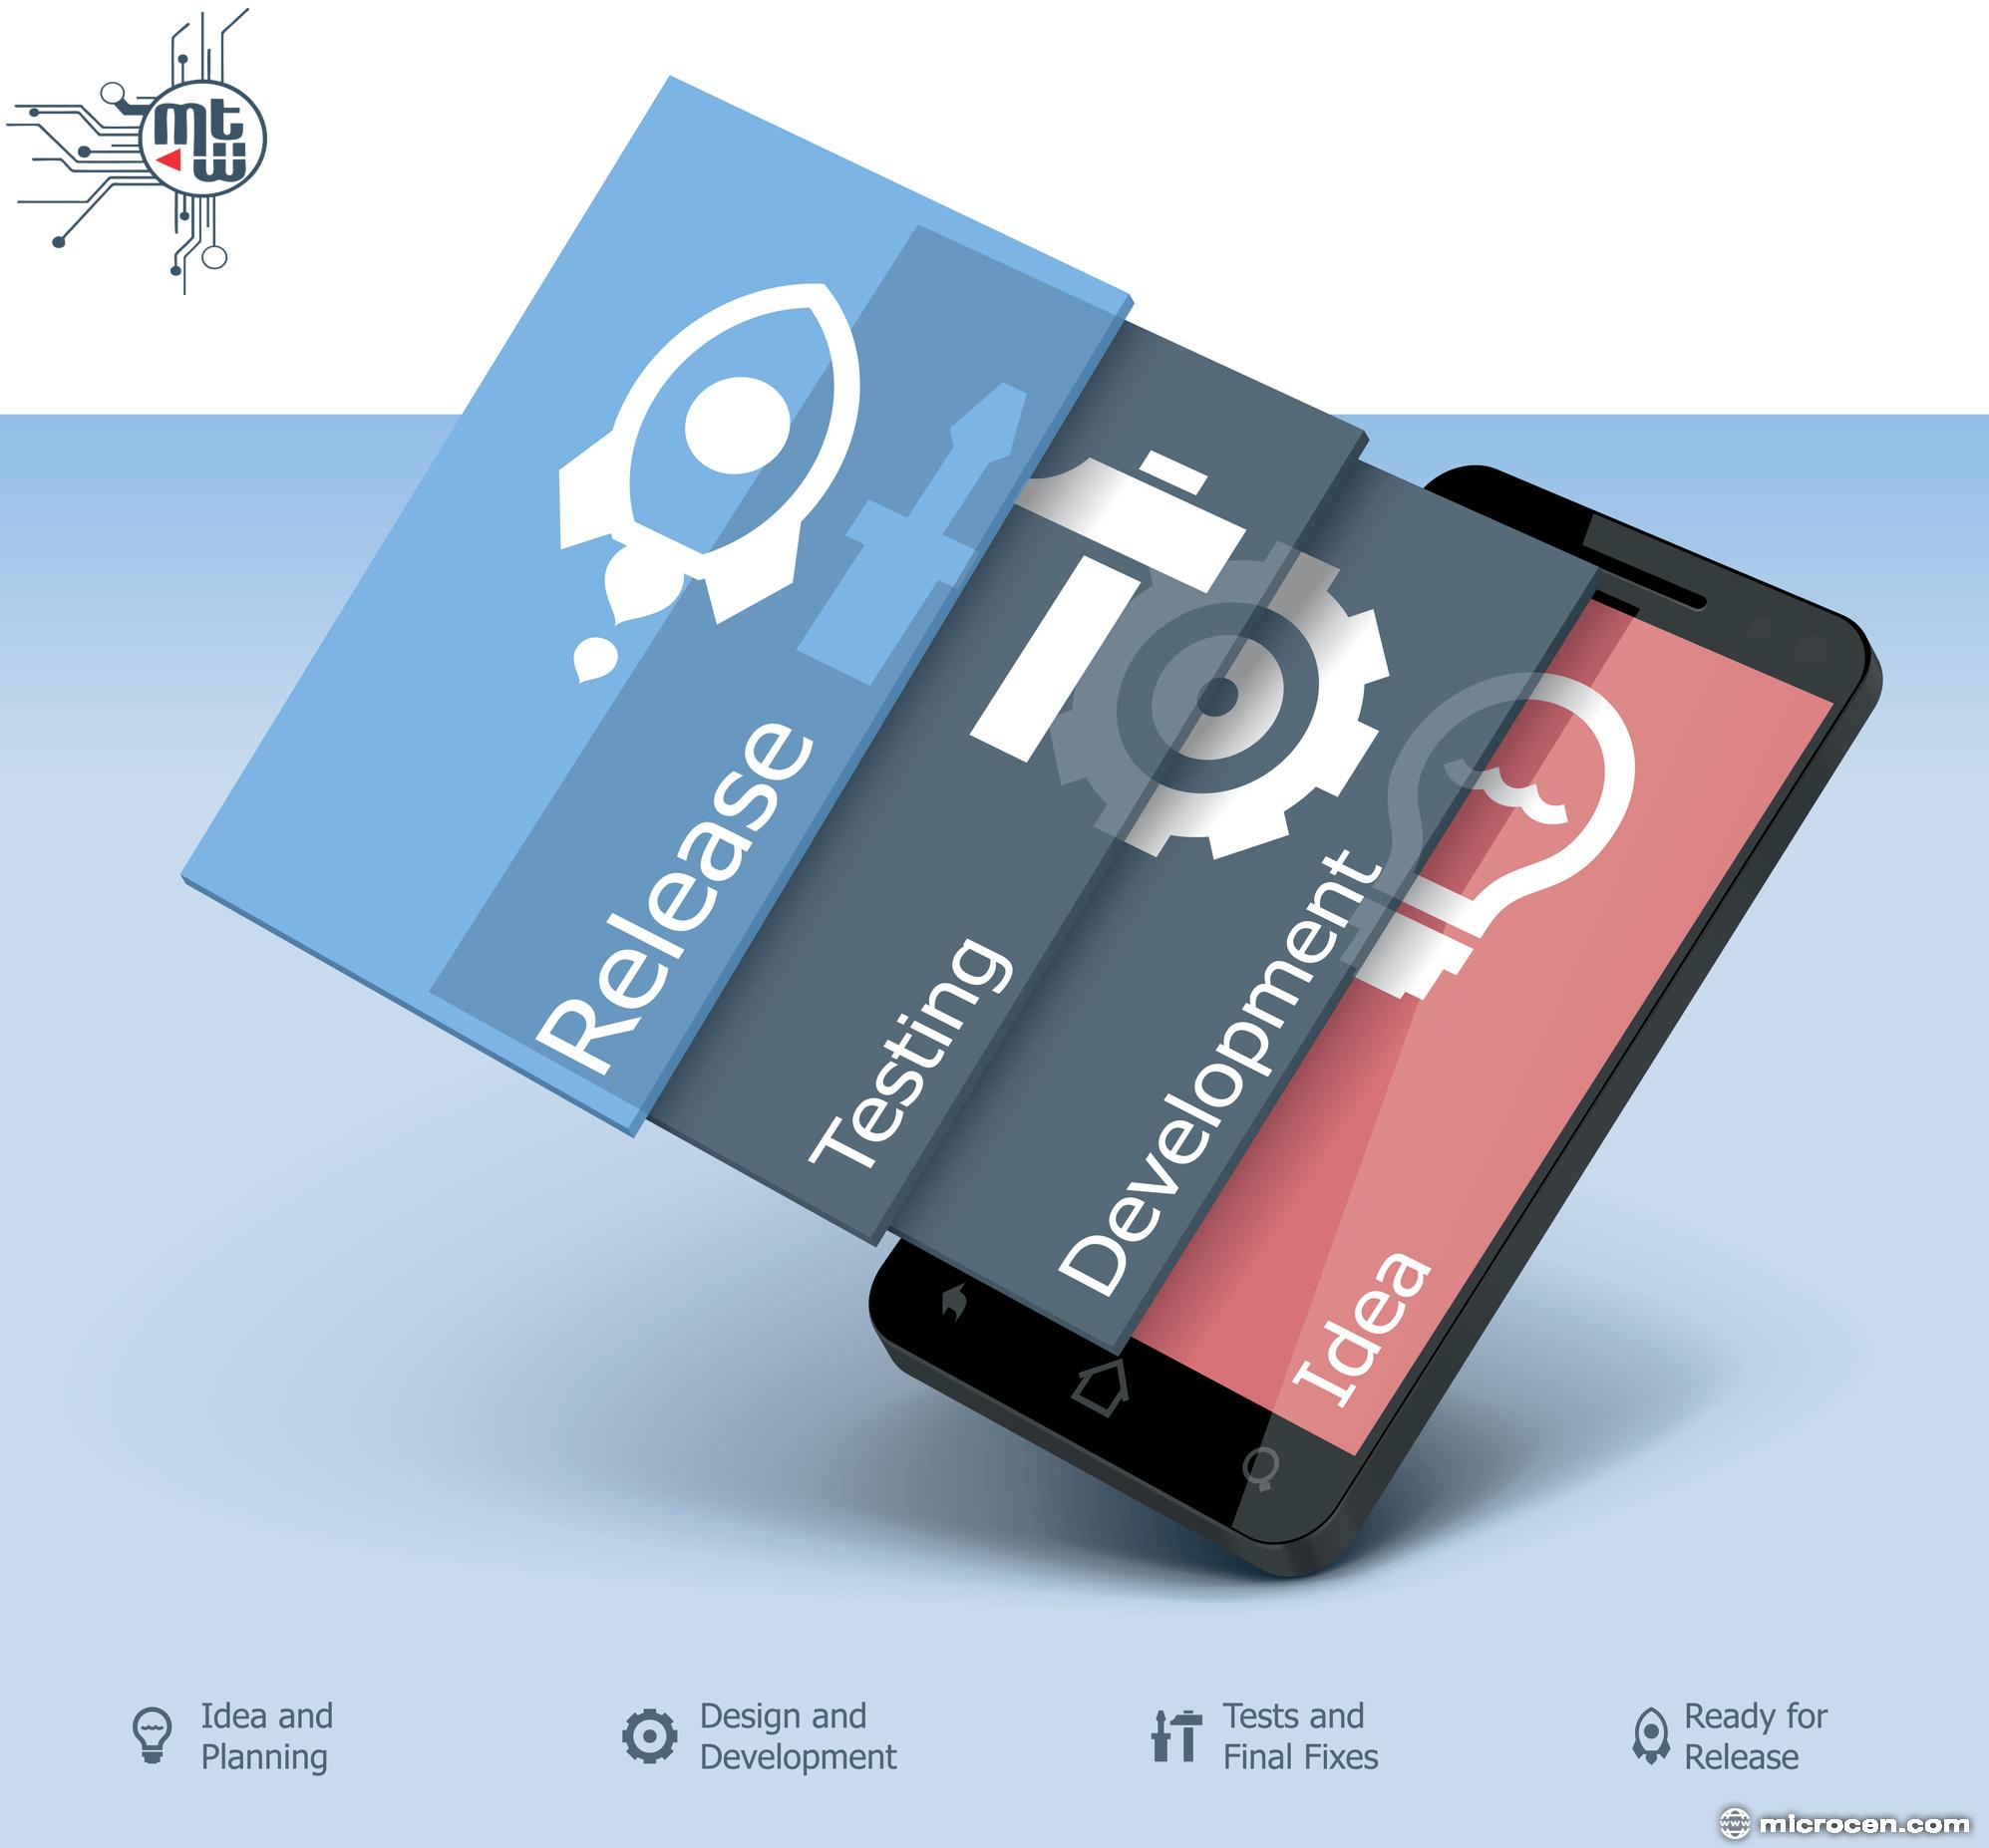 Pin by Microcen Web on website Iphone app development